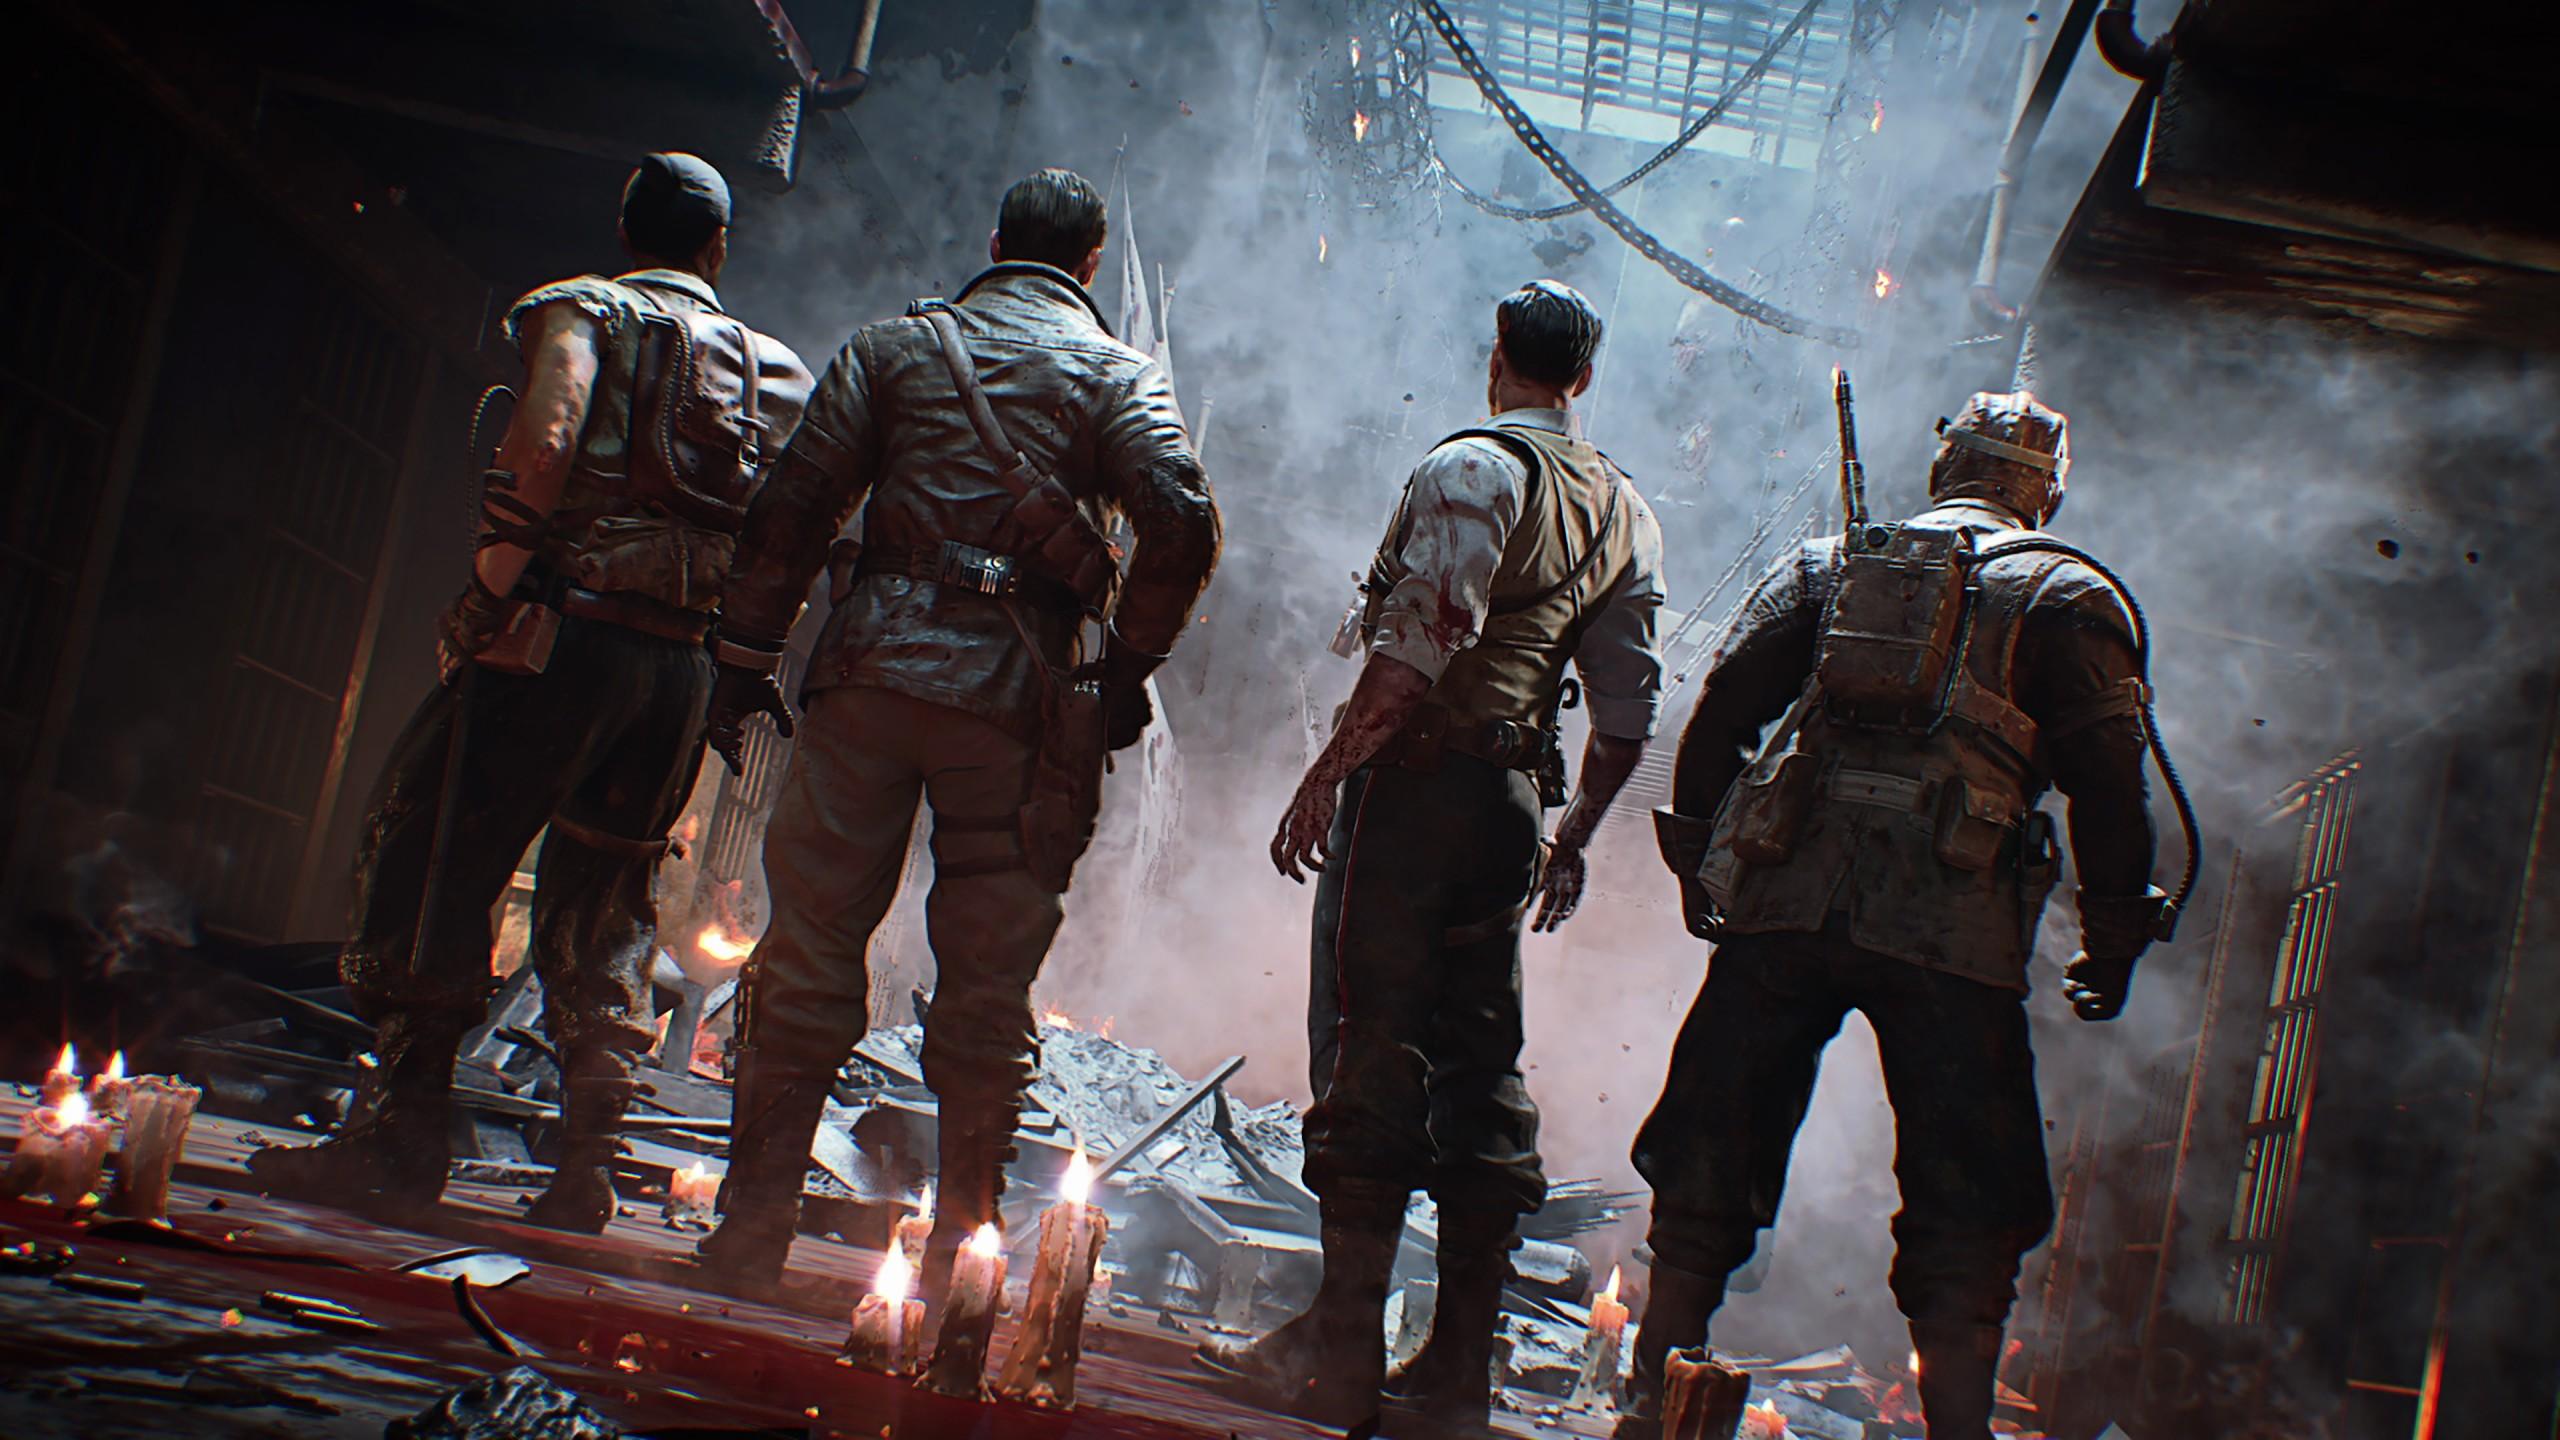 Pubg Mobile Helmet Wallpaper Pubg Pubgwallpapers: Wallpaper Call Of Duty Black Ops 4, Screenshot, 4K, Games